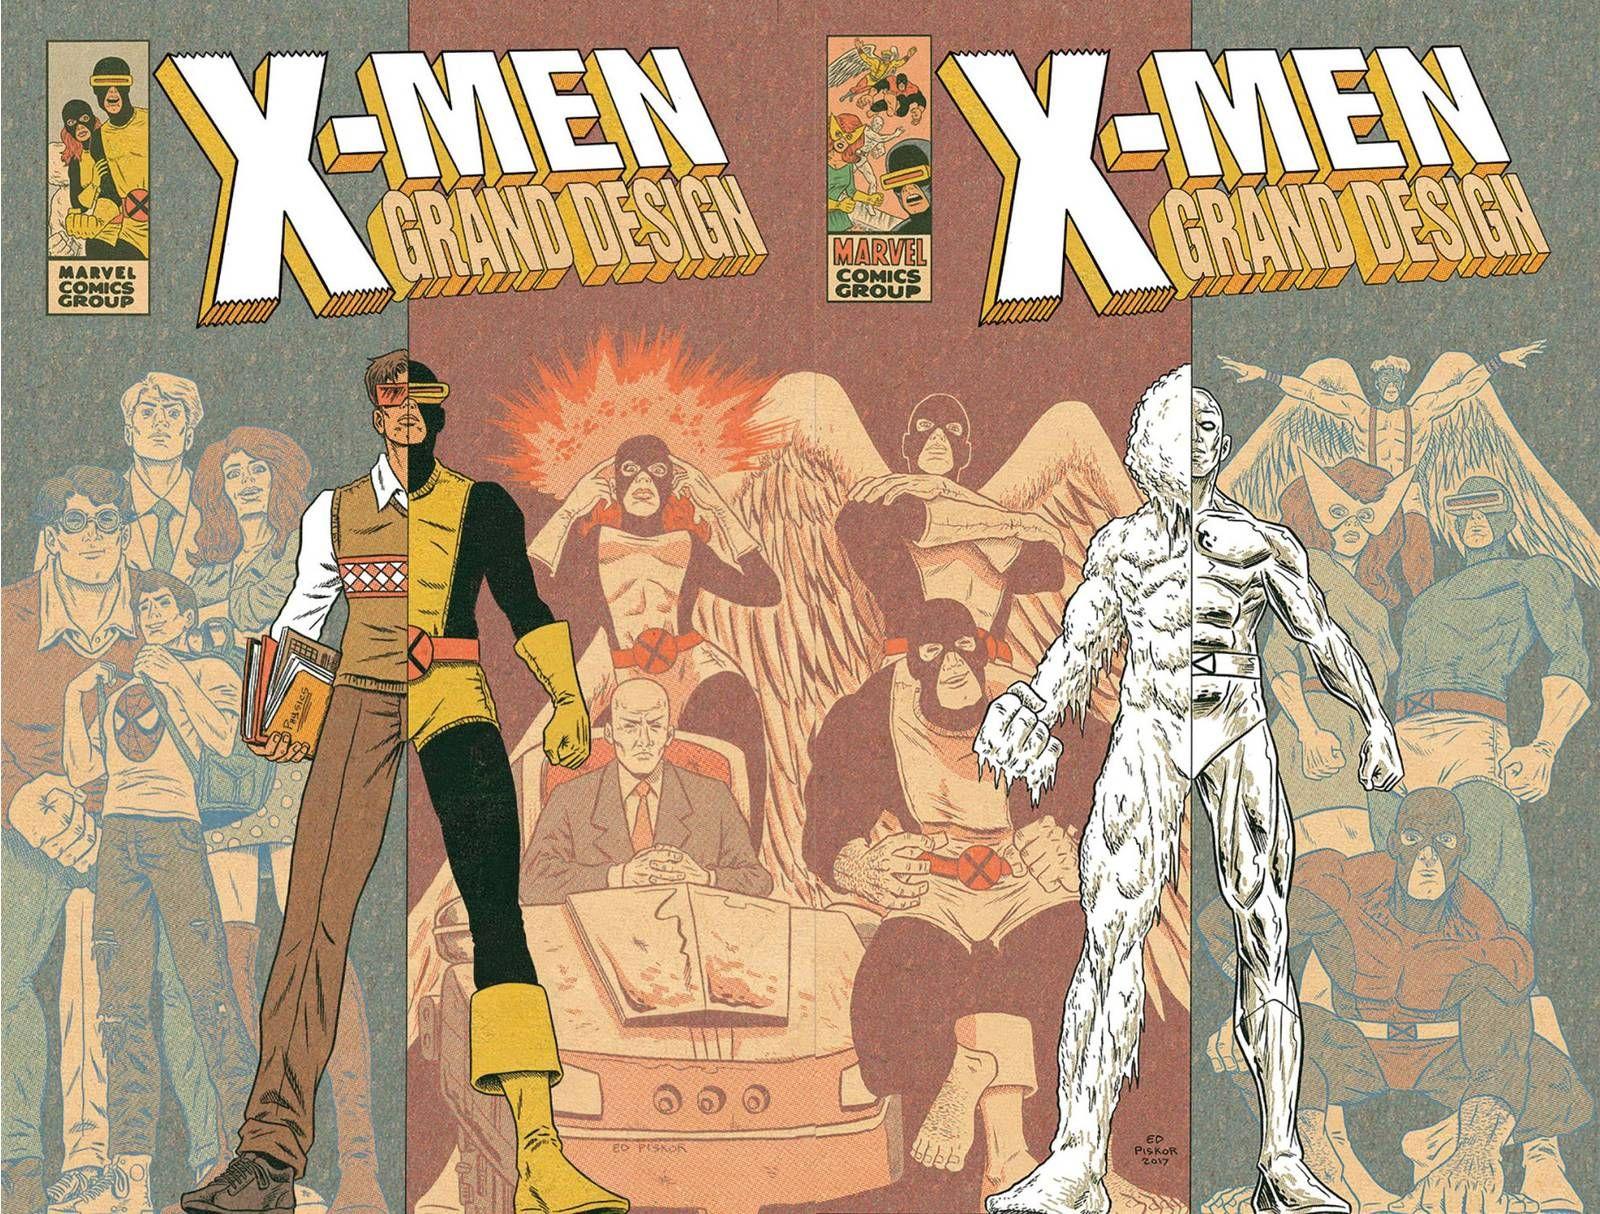 In X Men Grand Design Ed Piskor Tells The Superheroes Whole Story Grand Designs Comics X Men